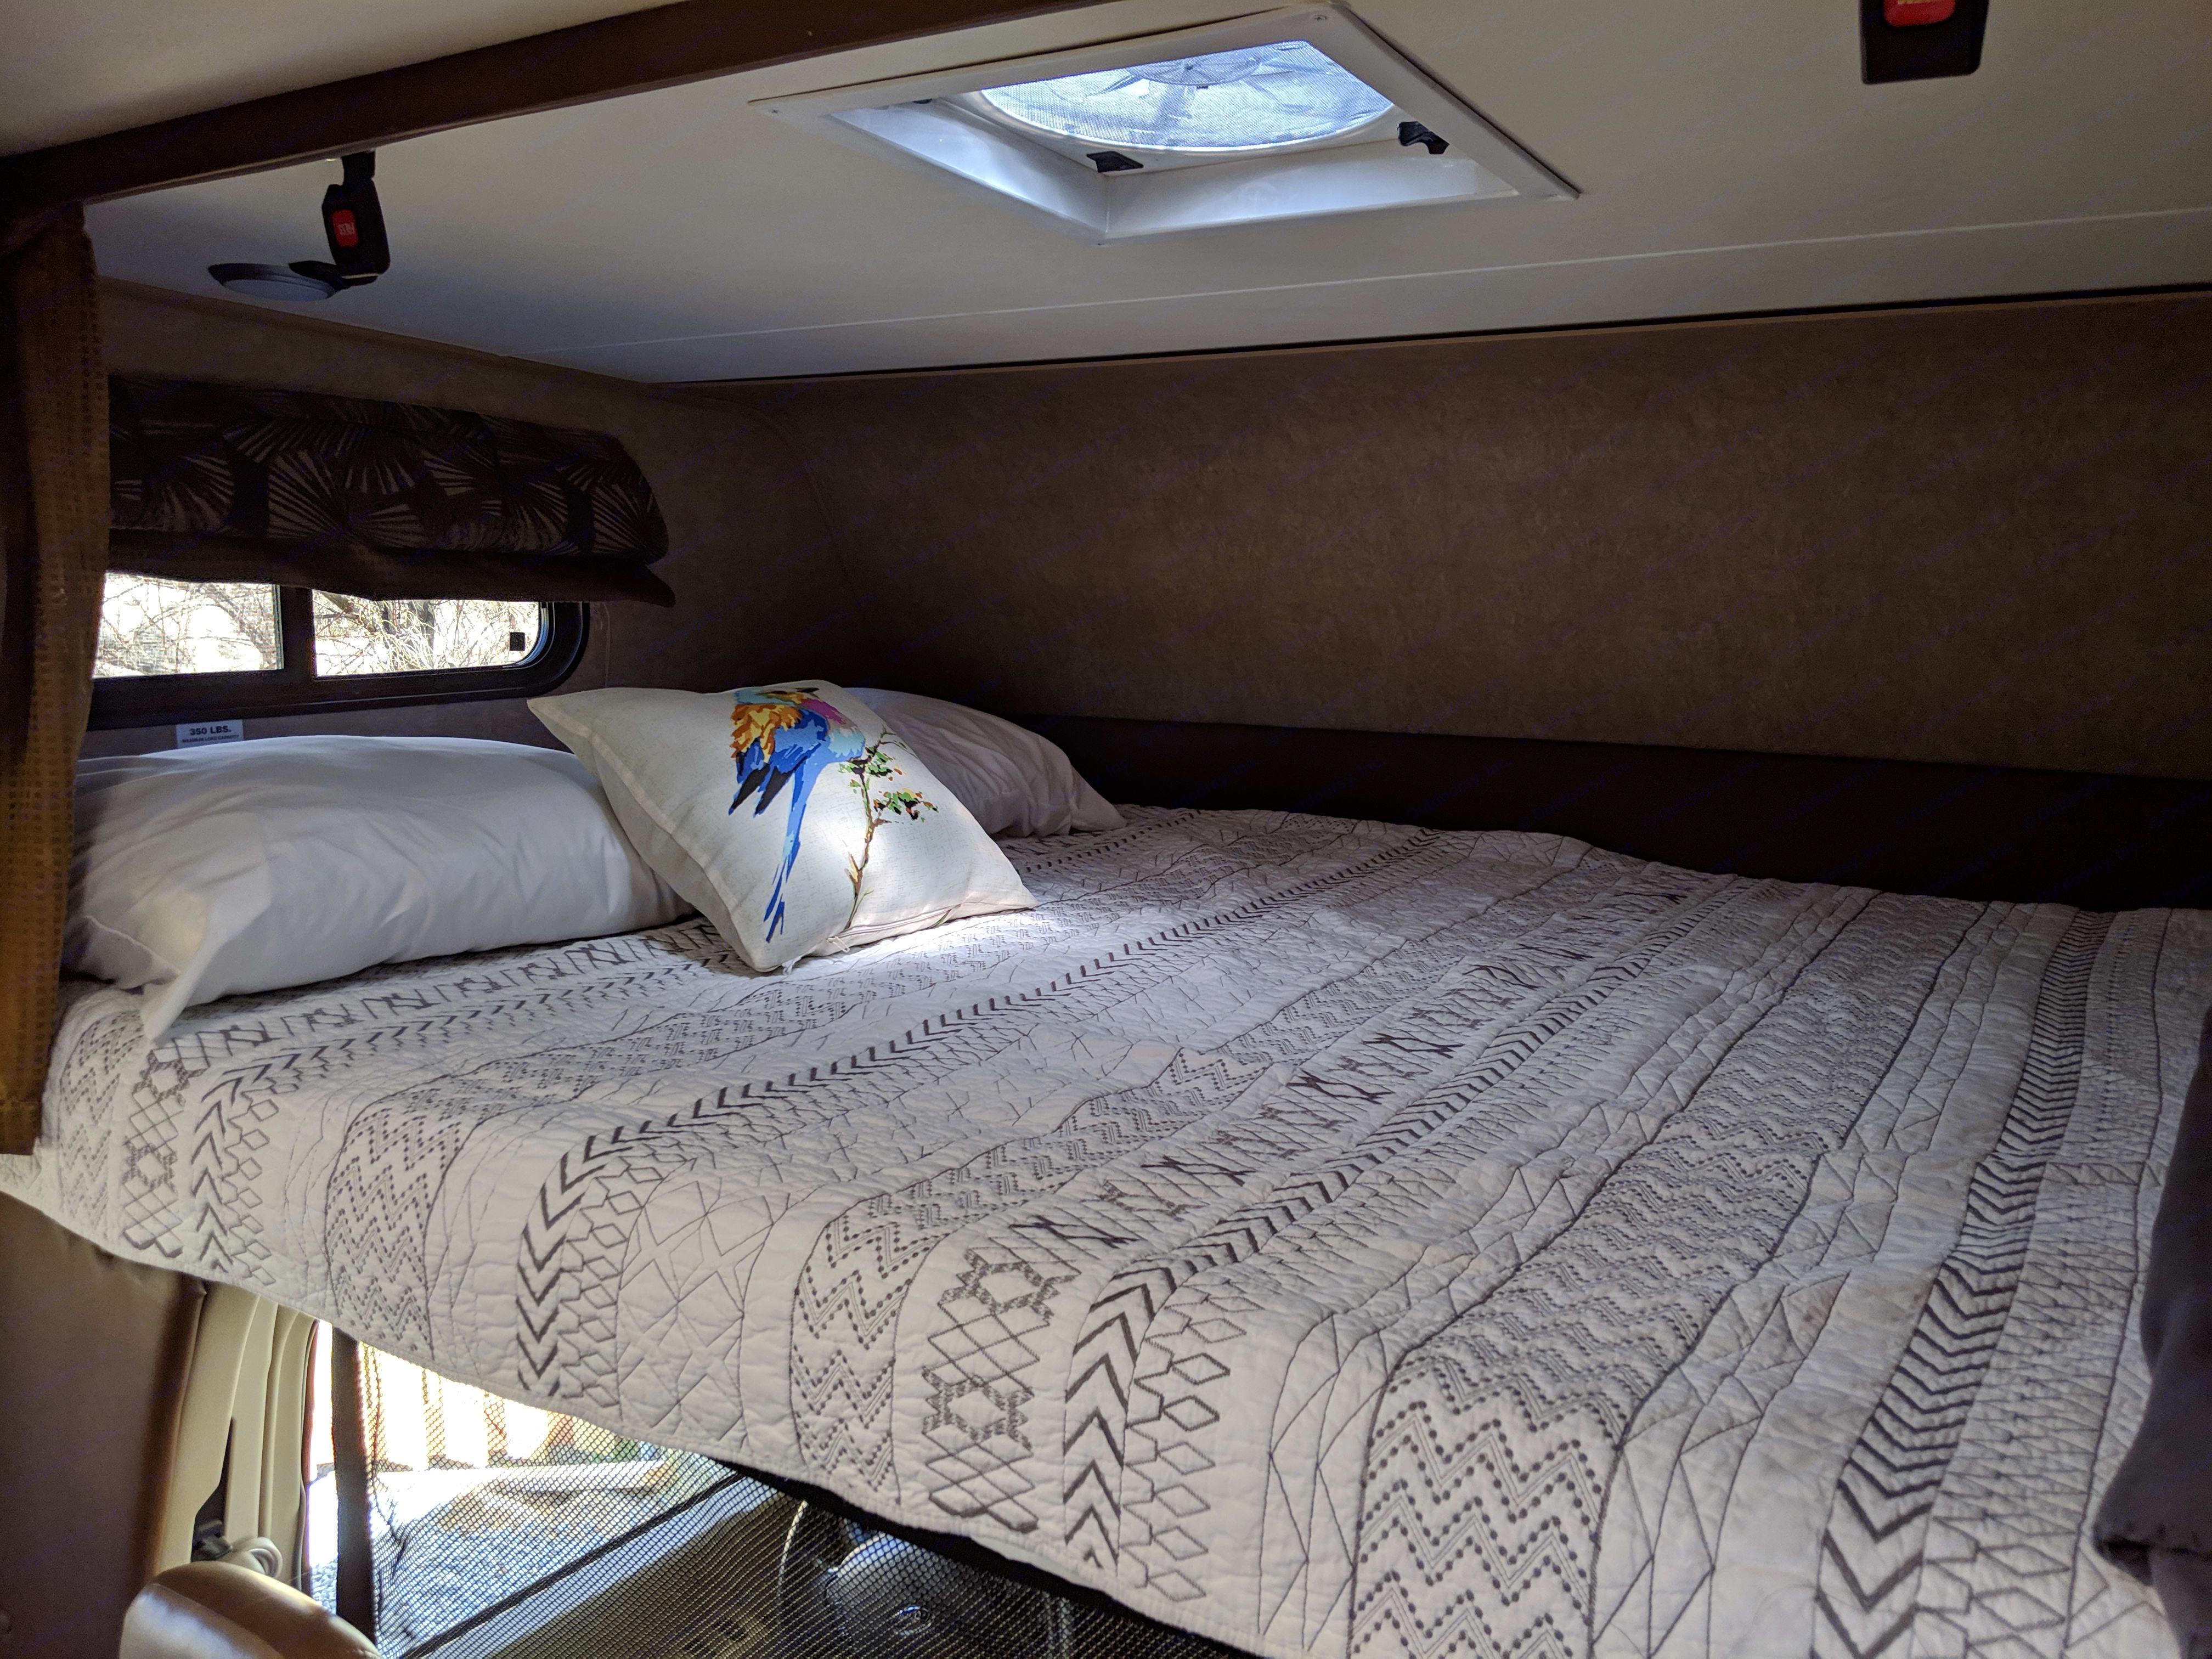 Cabover bed with linens. Coachmen Leprechaun 2016